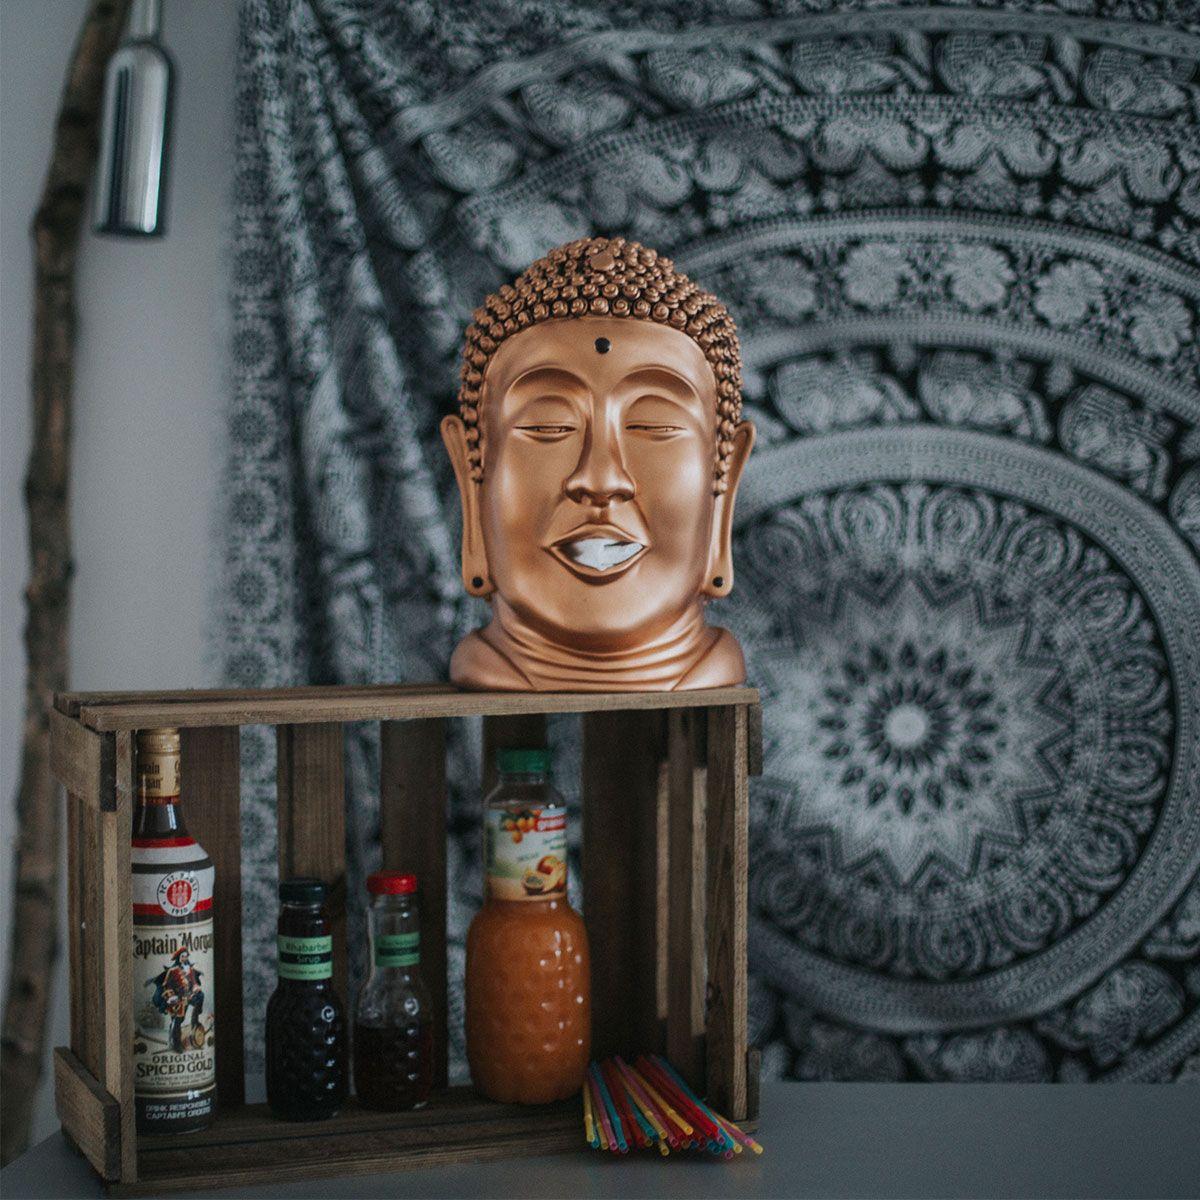 Buddha Taschentuchspender | Buddha Kop #buddha #buddhagift #buddhahead #geschenkideen #geschenkidee #home #interior #gift #scandi #skandinavianliving #interioridea #homedecor #decoridea #giftideas #giftsforher #buddhalove #spiritualgift #spiritual